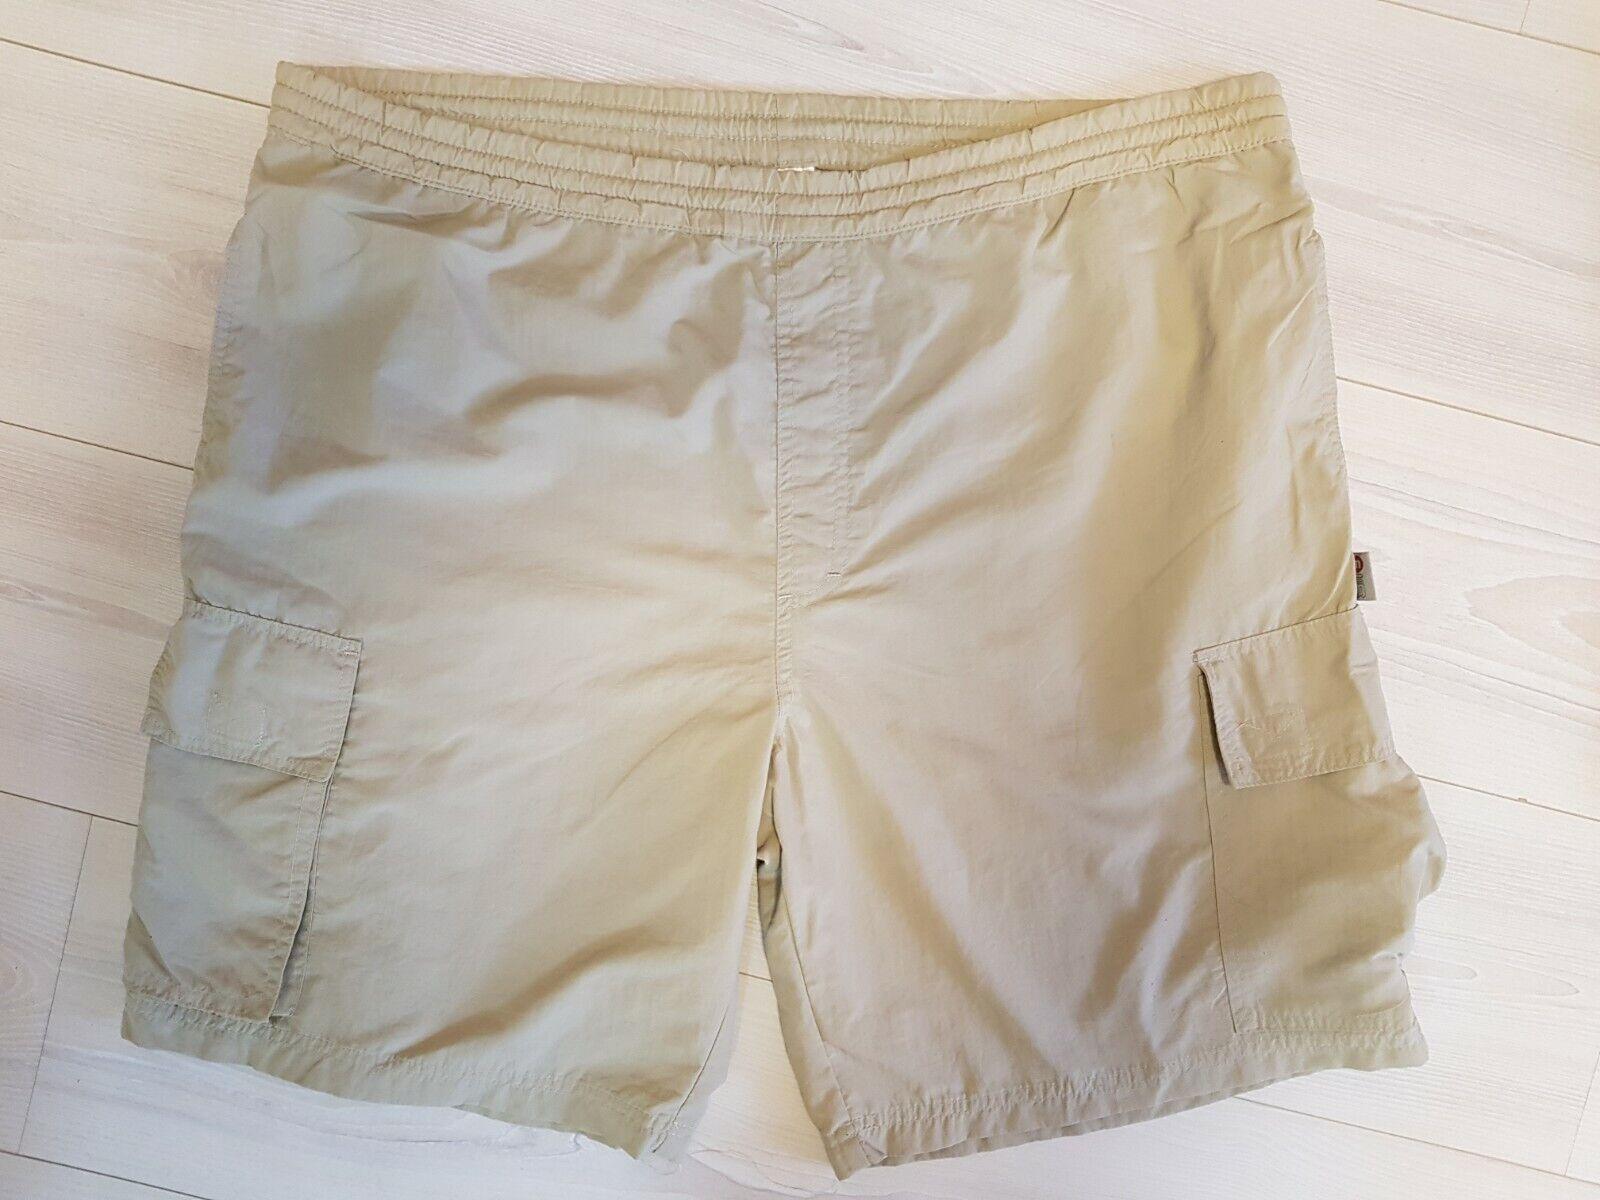 Kurze Hosen Herren Cipo Baxx Test Vergleich +++ Kurze Hosen